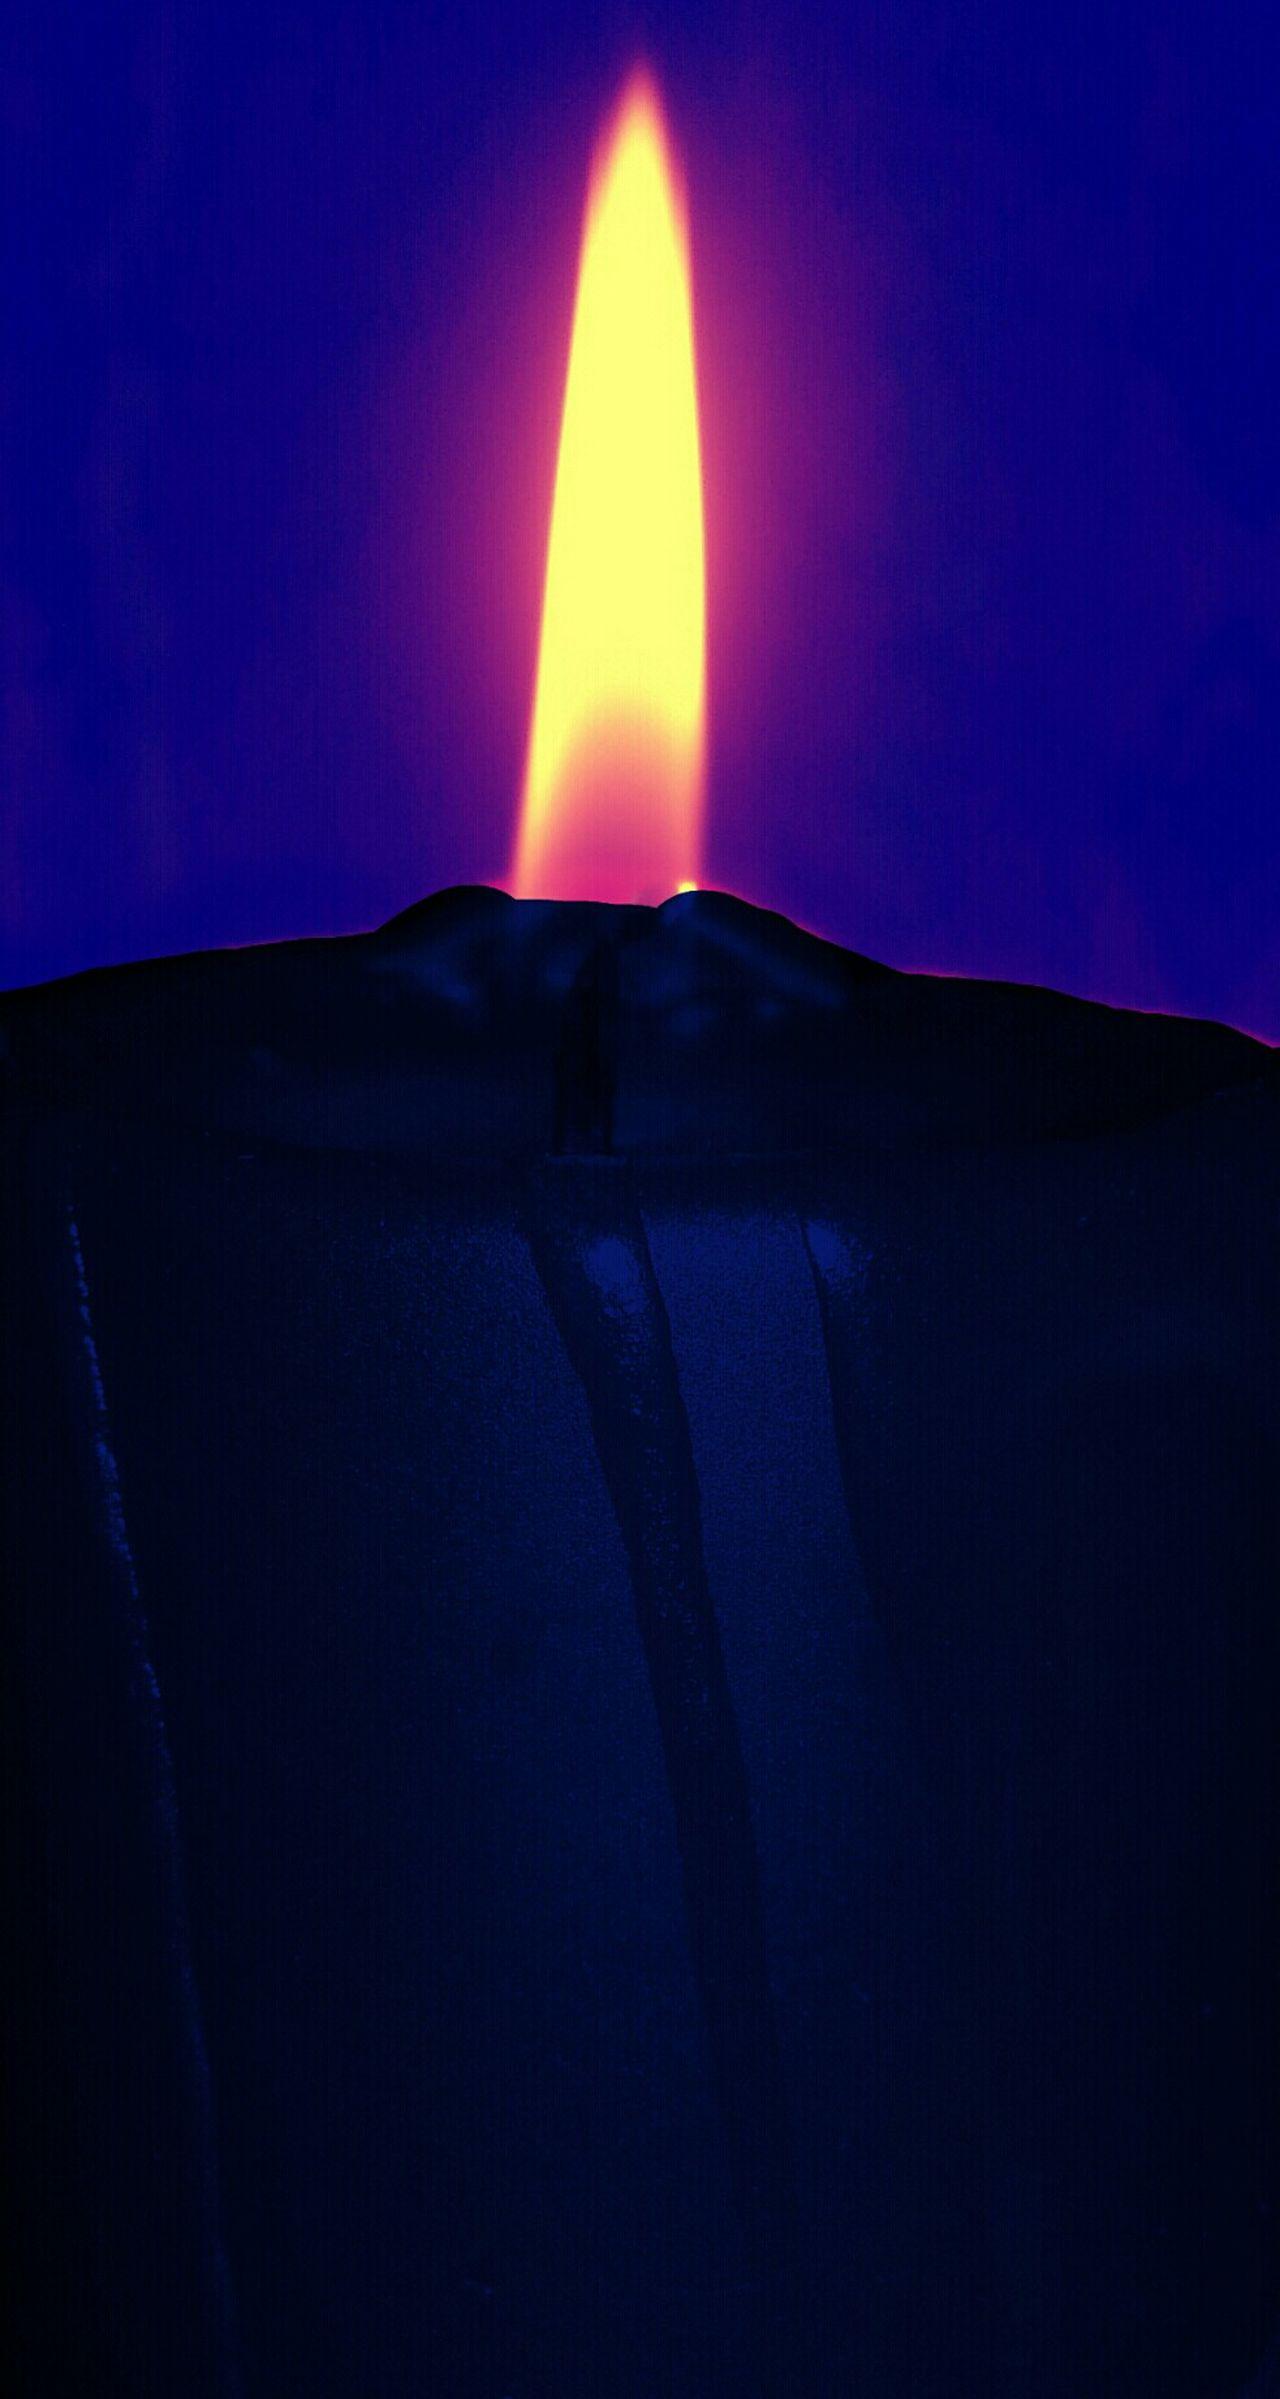 Kerzenlicht ... Candlelight :-) Eyeemphotography Beautiful Schön Candlelight Kerze Candle Kerzenzauber Lichterglanz Lichterzauber Taking Photos Candles-collection The Week On Eyem Beliebte Fotos Hello World EyeEm Candle Collection Kerzenfoto Kerzenlicht Colour Of Life Eyeem Market Gemütlichkeit Coziness EyeEm Gallery I Like It Check This Out